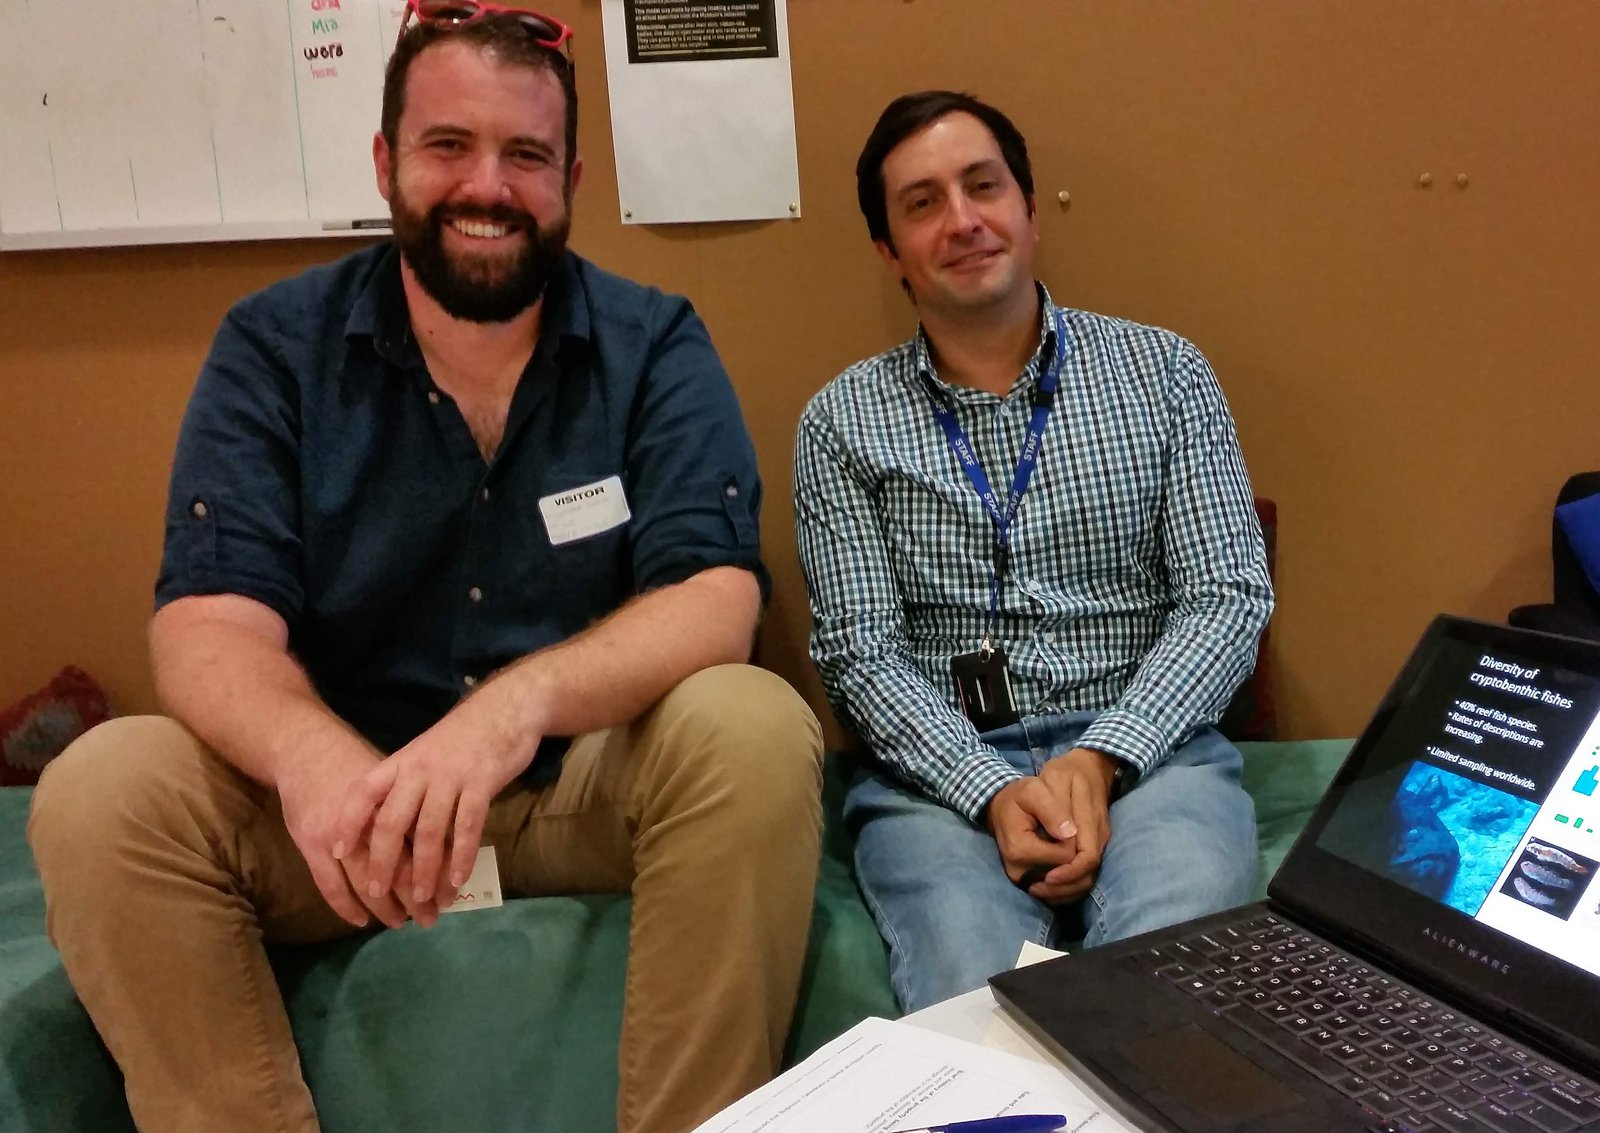 Chris Goatley and Joseph Dibattista